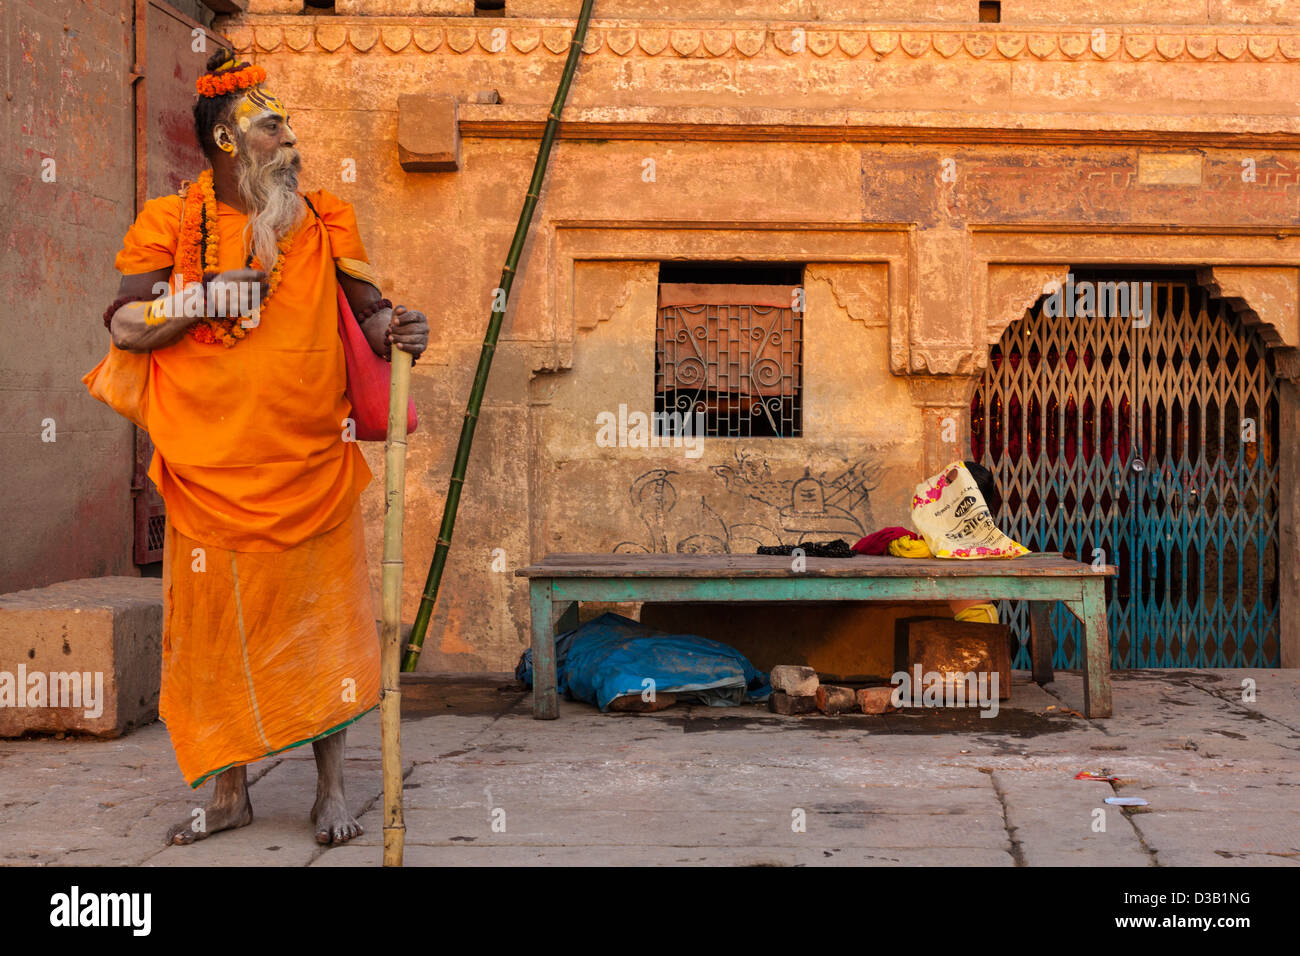 Sadhu standing at dawn, Varanasi, India - Stock Image